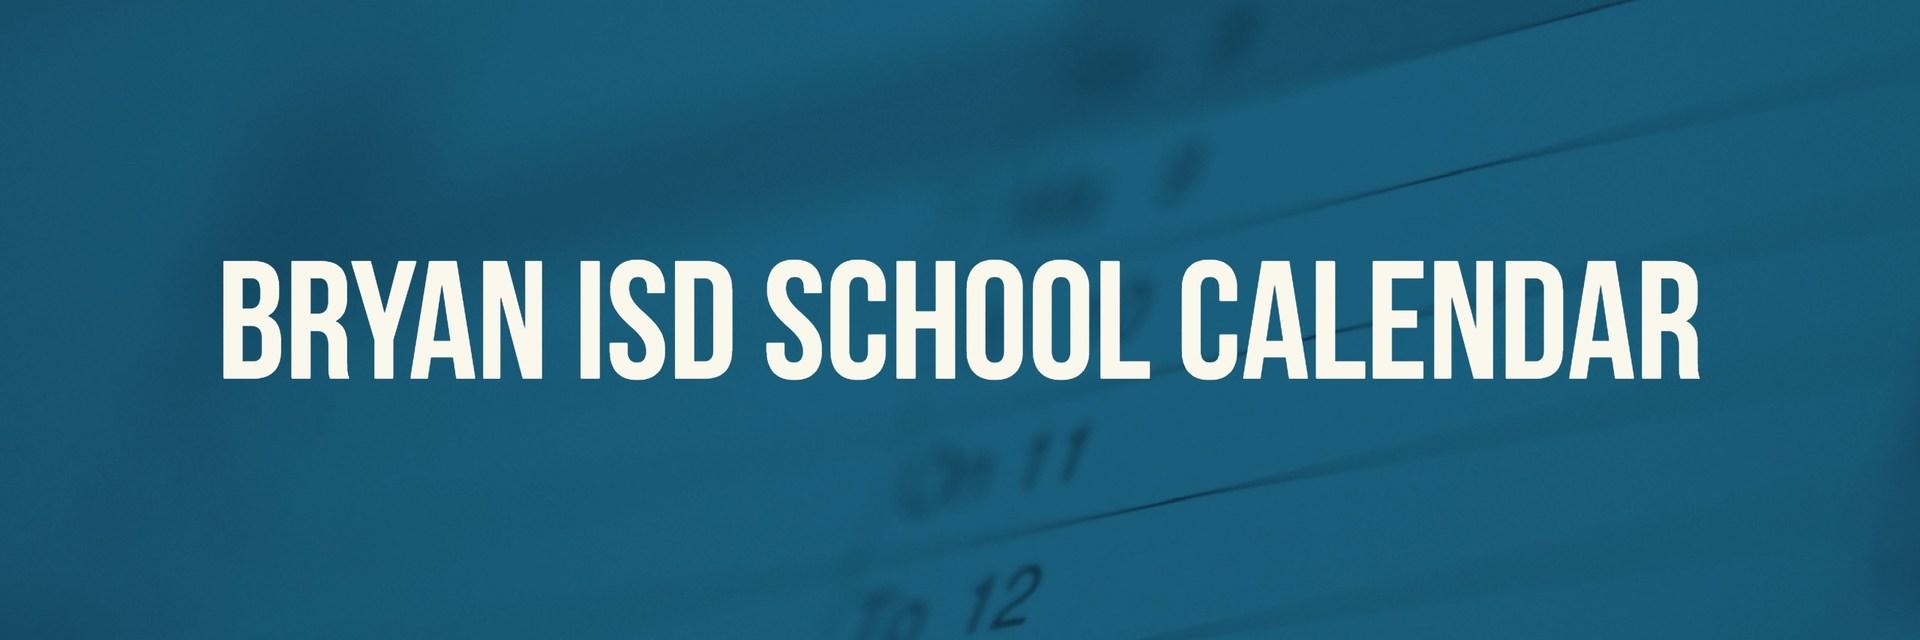 Bryan Isd Calendar 2020 School Calendar, Testing & Fine Arts/Athletics Events